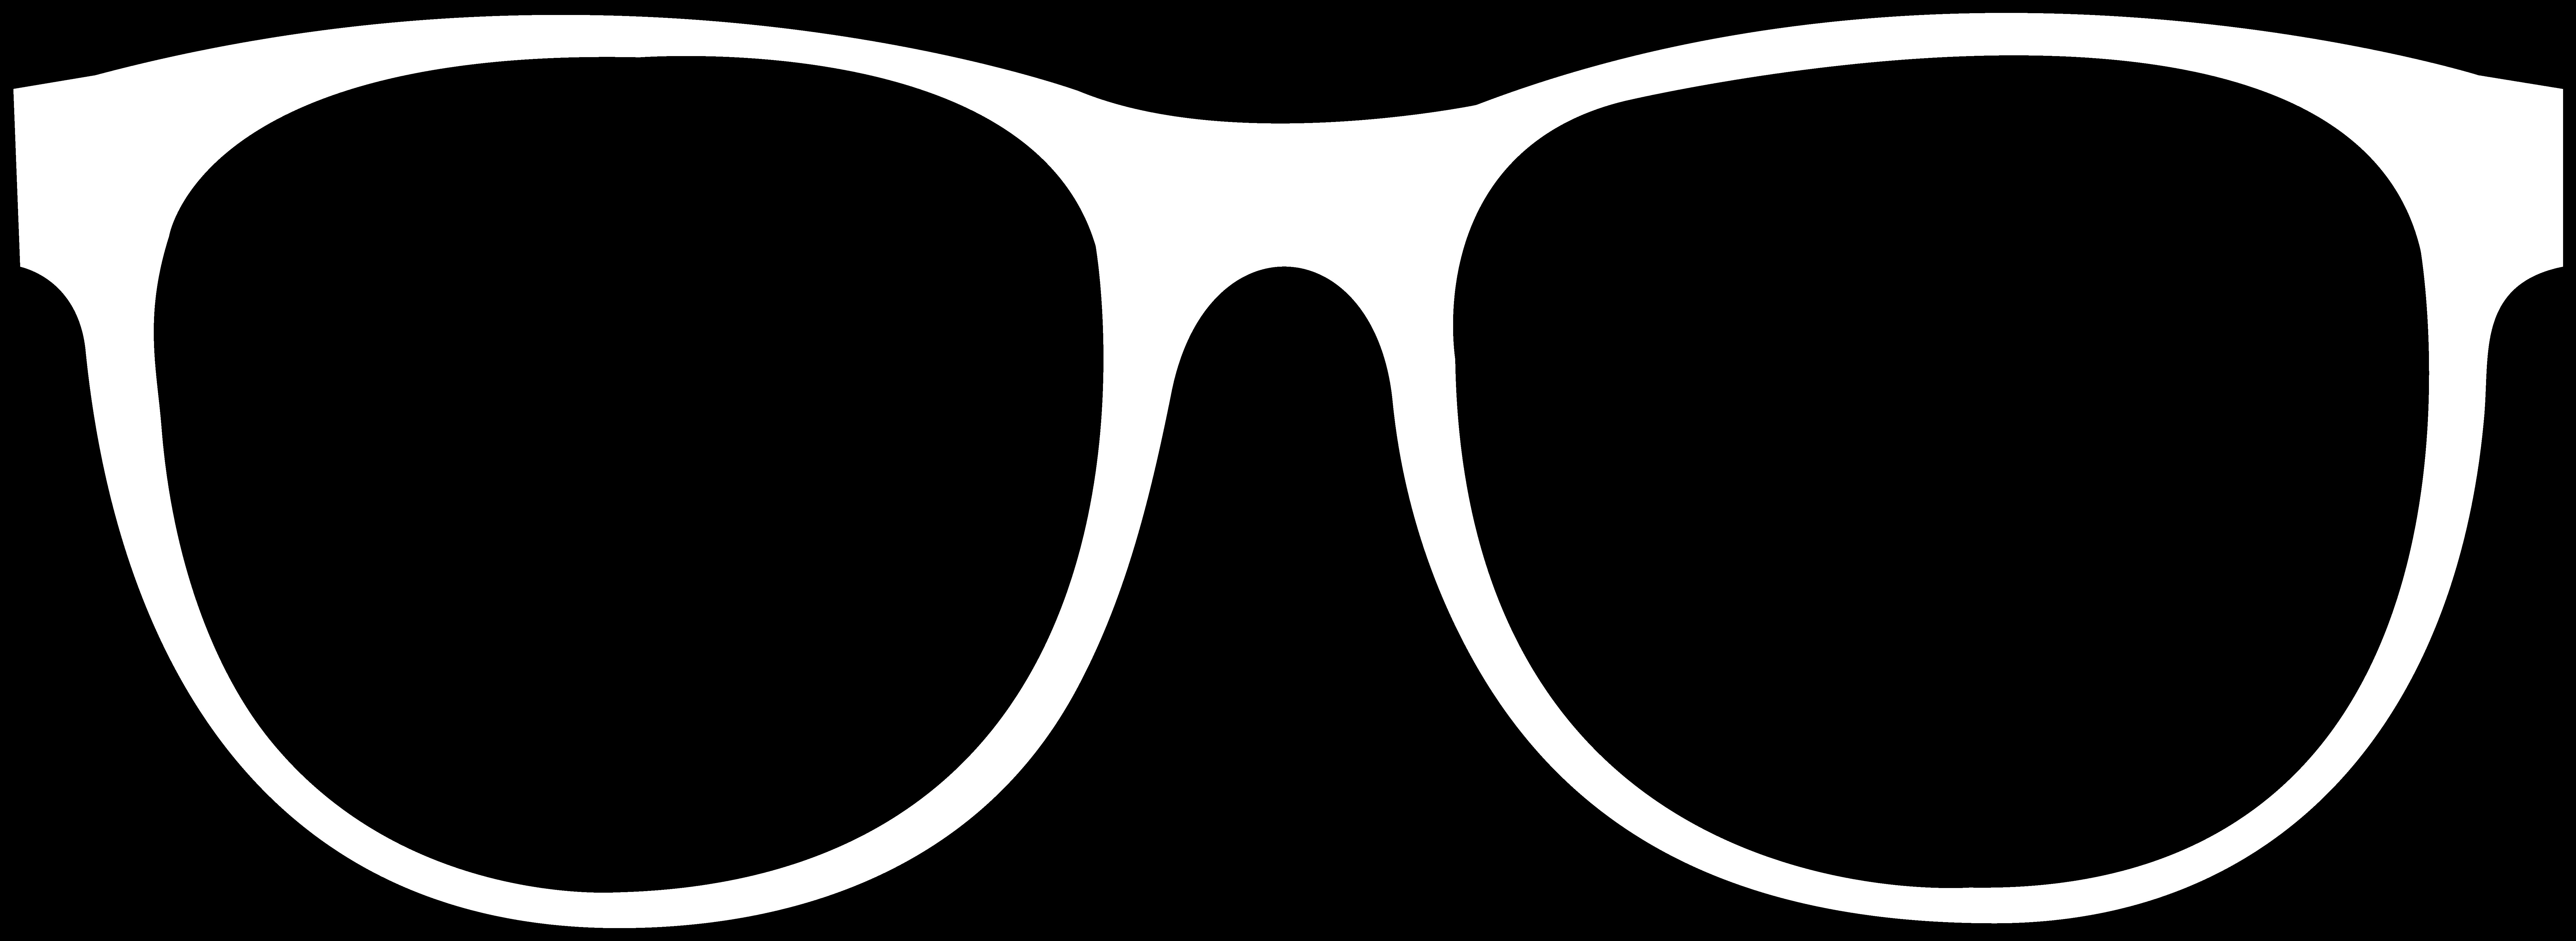 Sunglasses Outline Clipart